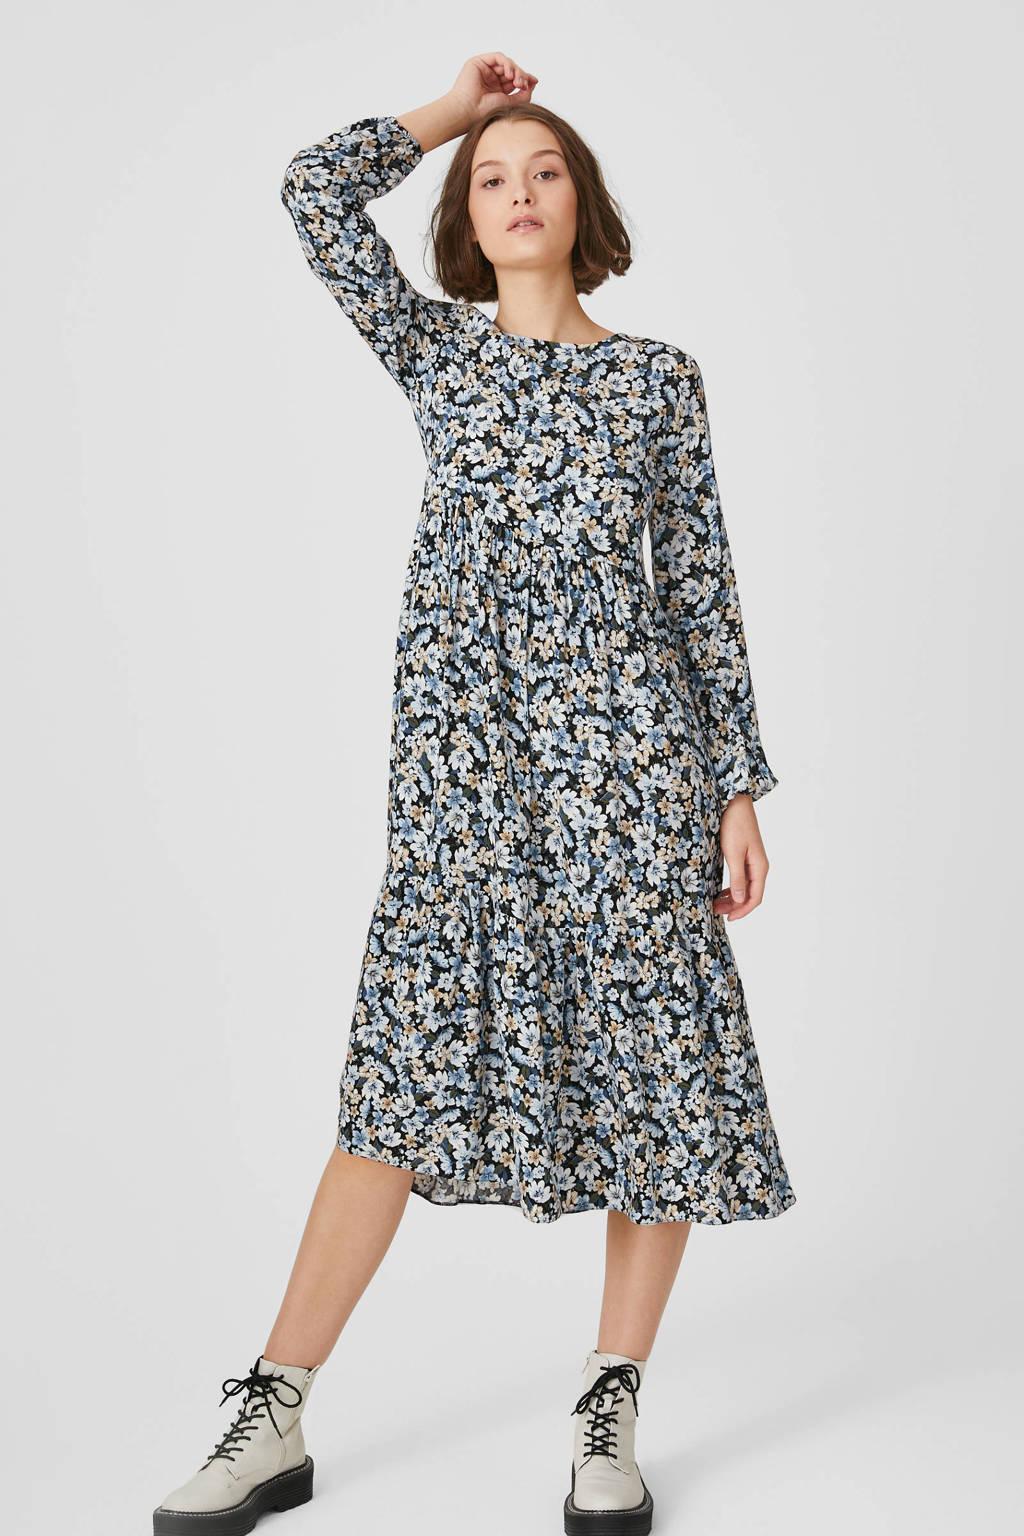 C&A Clockhouse gebloemde maxi jurk blauw/zwart/beige, Blauw/zwart/beige